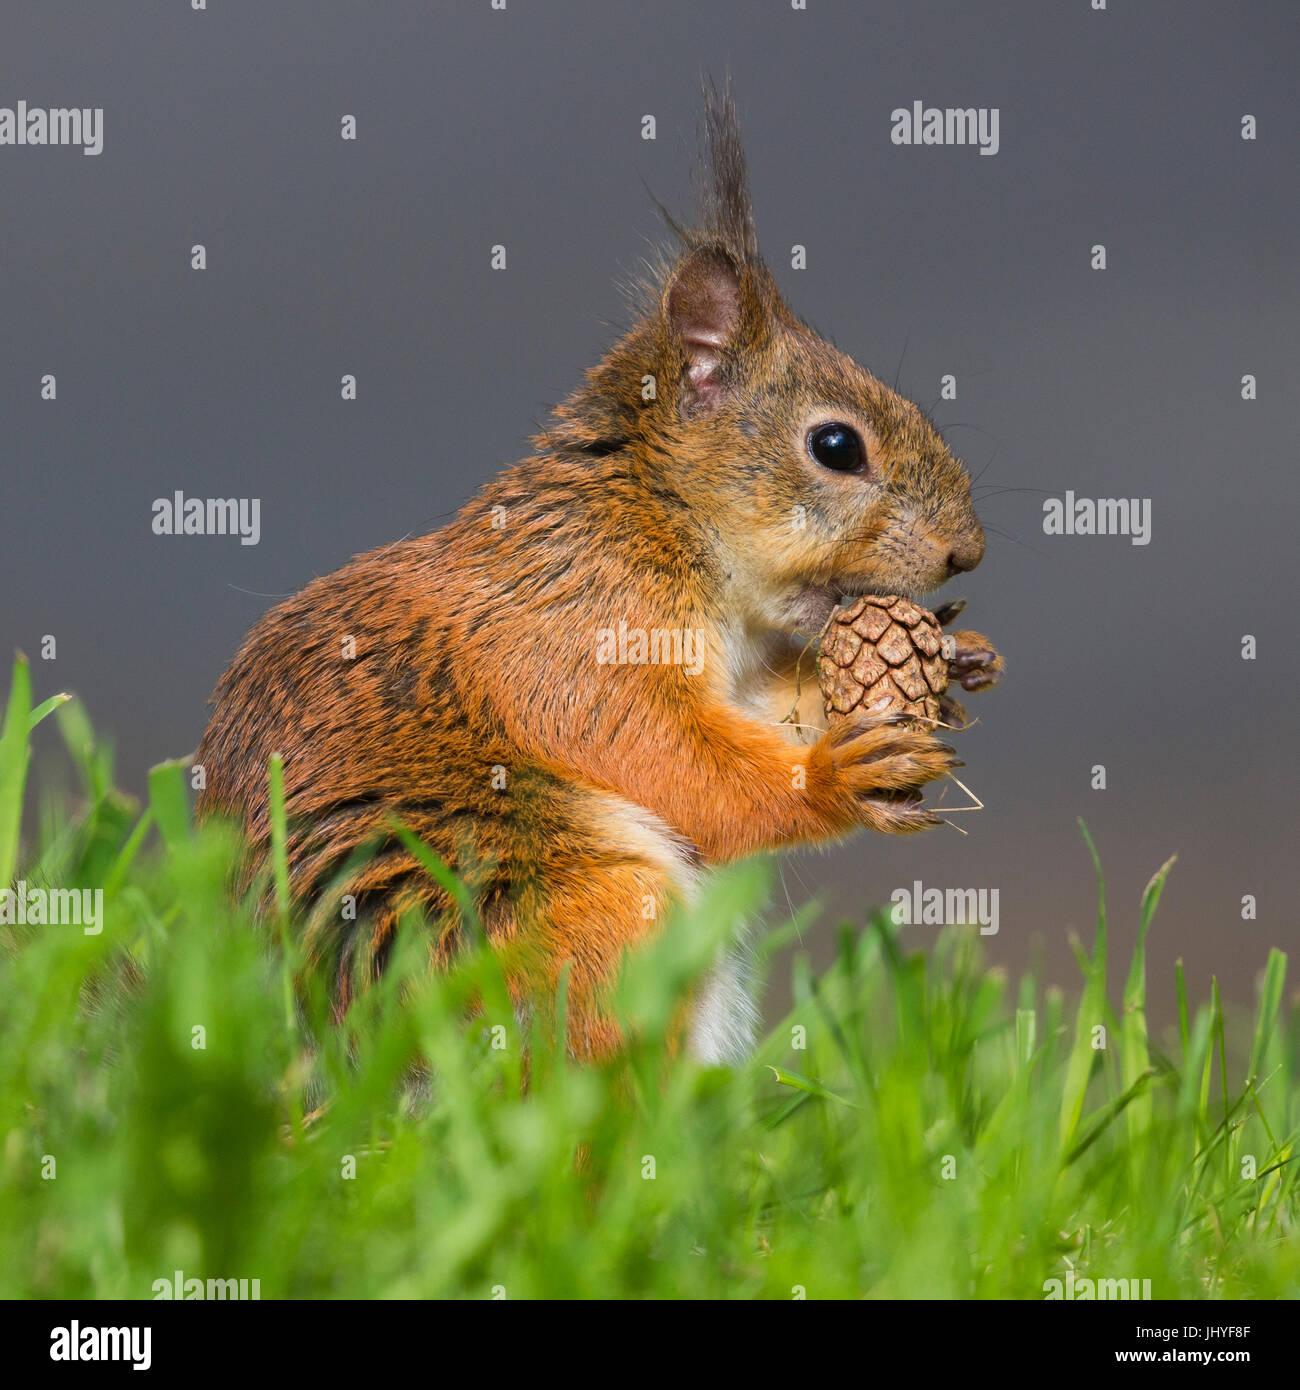 Ardilla roja (Sciurus vulgaris), hembra adulta alimentándose en un cono de pino Imagen De Stock